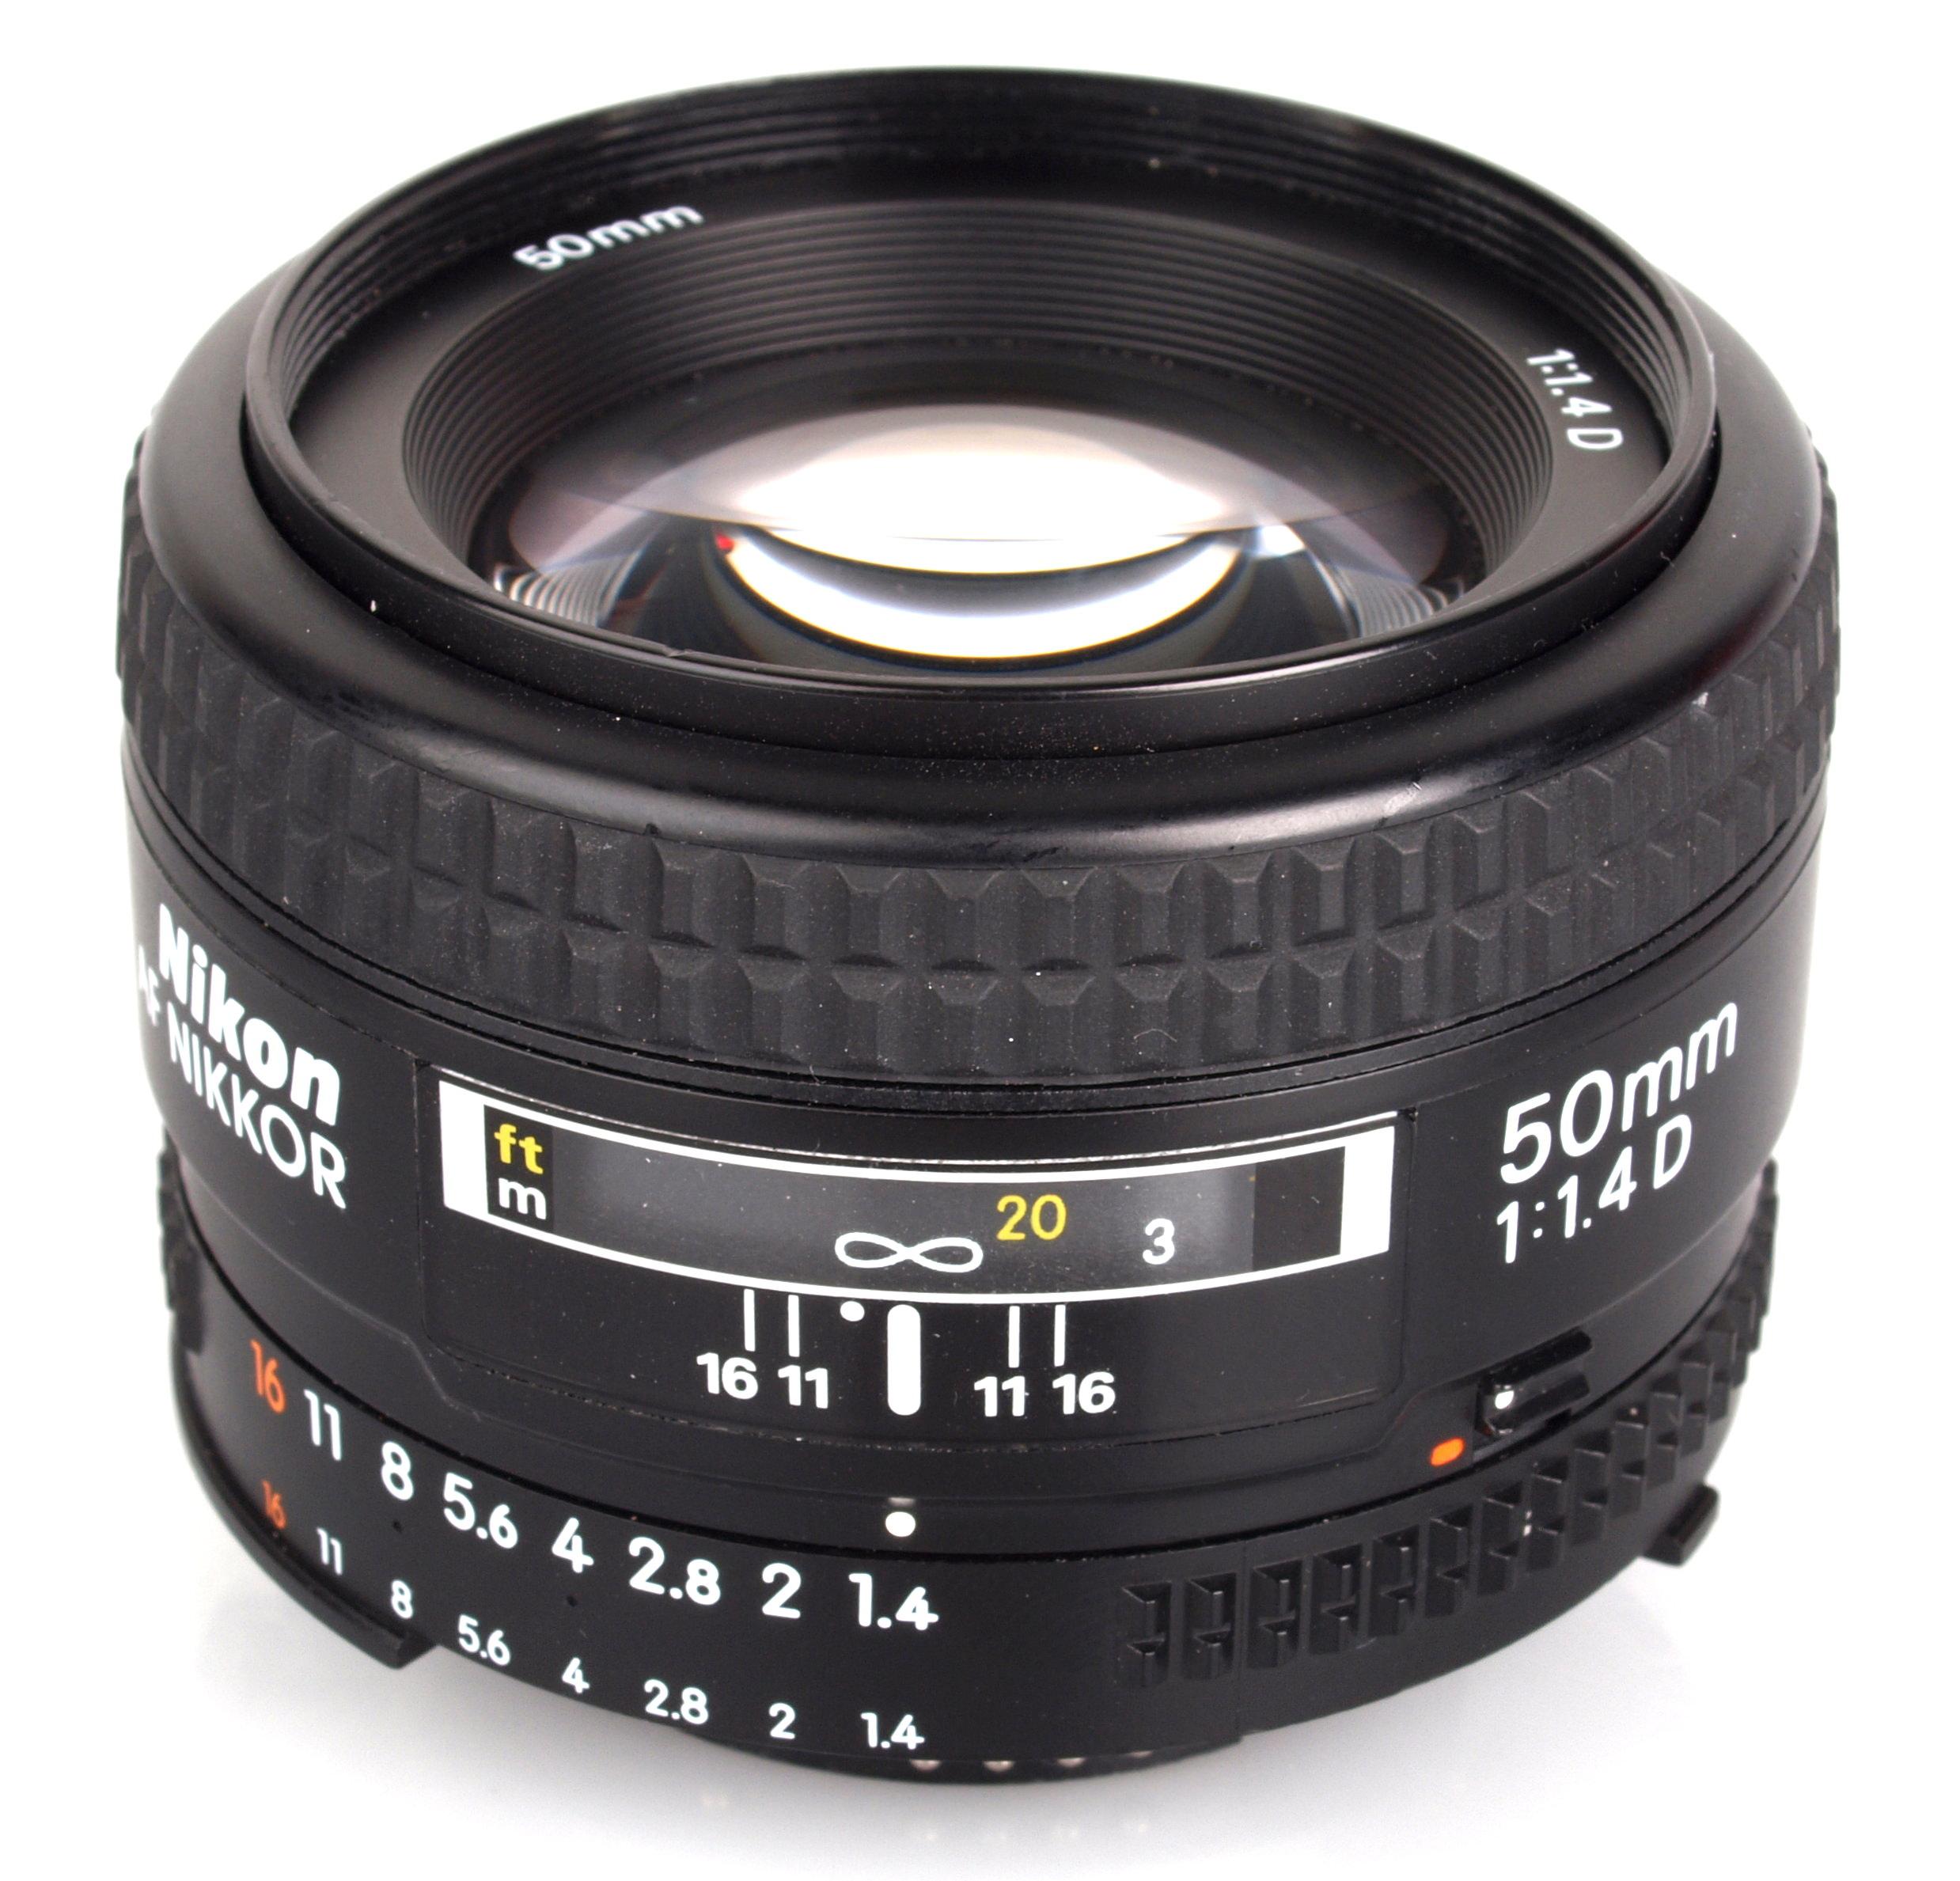 Nikon Af-s 50 F1,4 G Review | Fotografia Milano